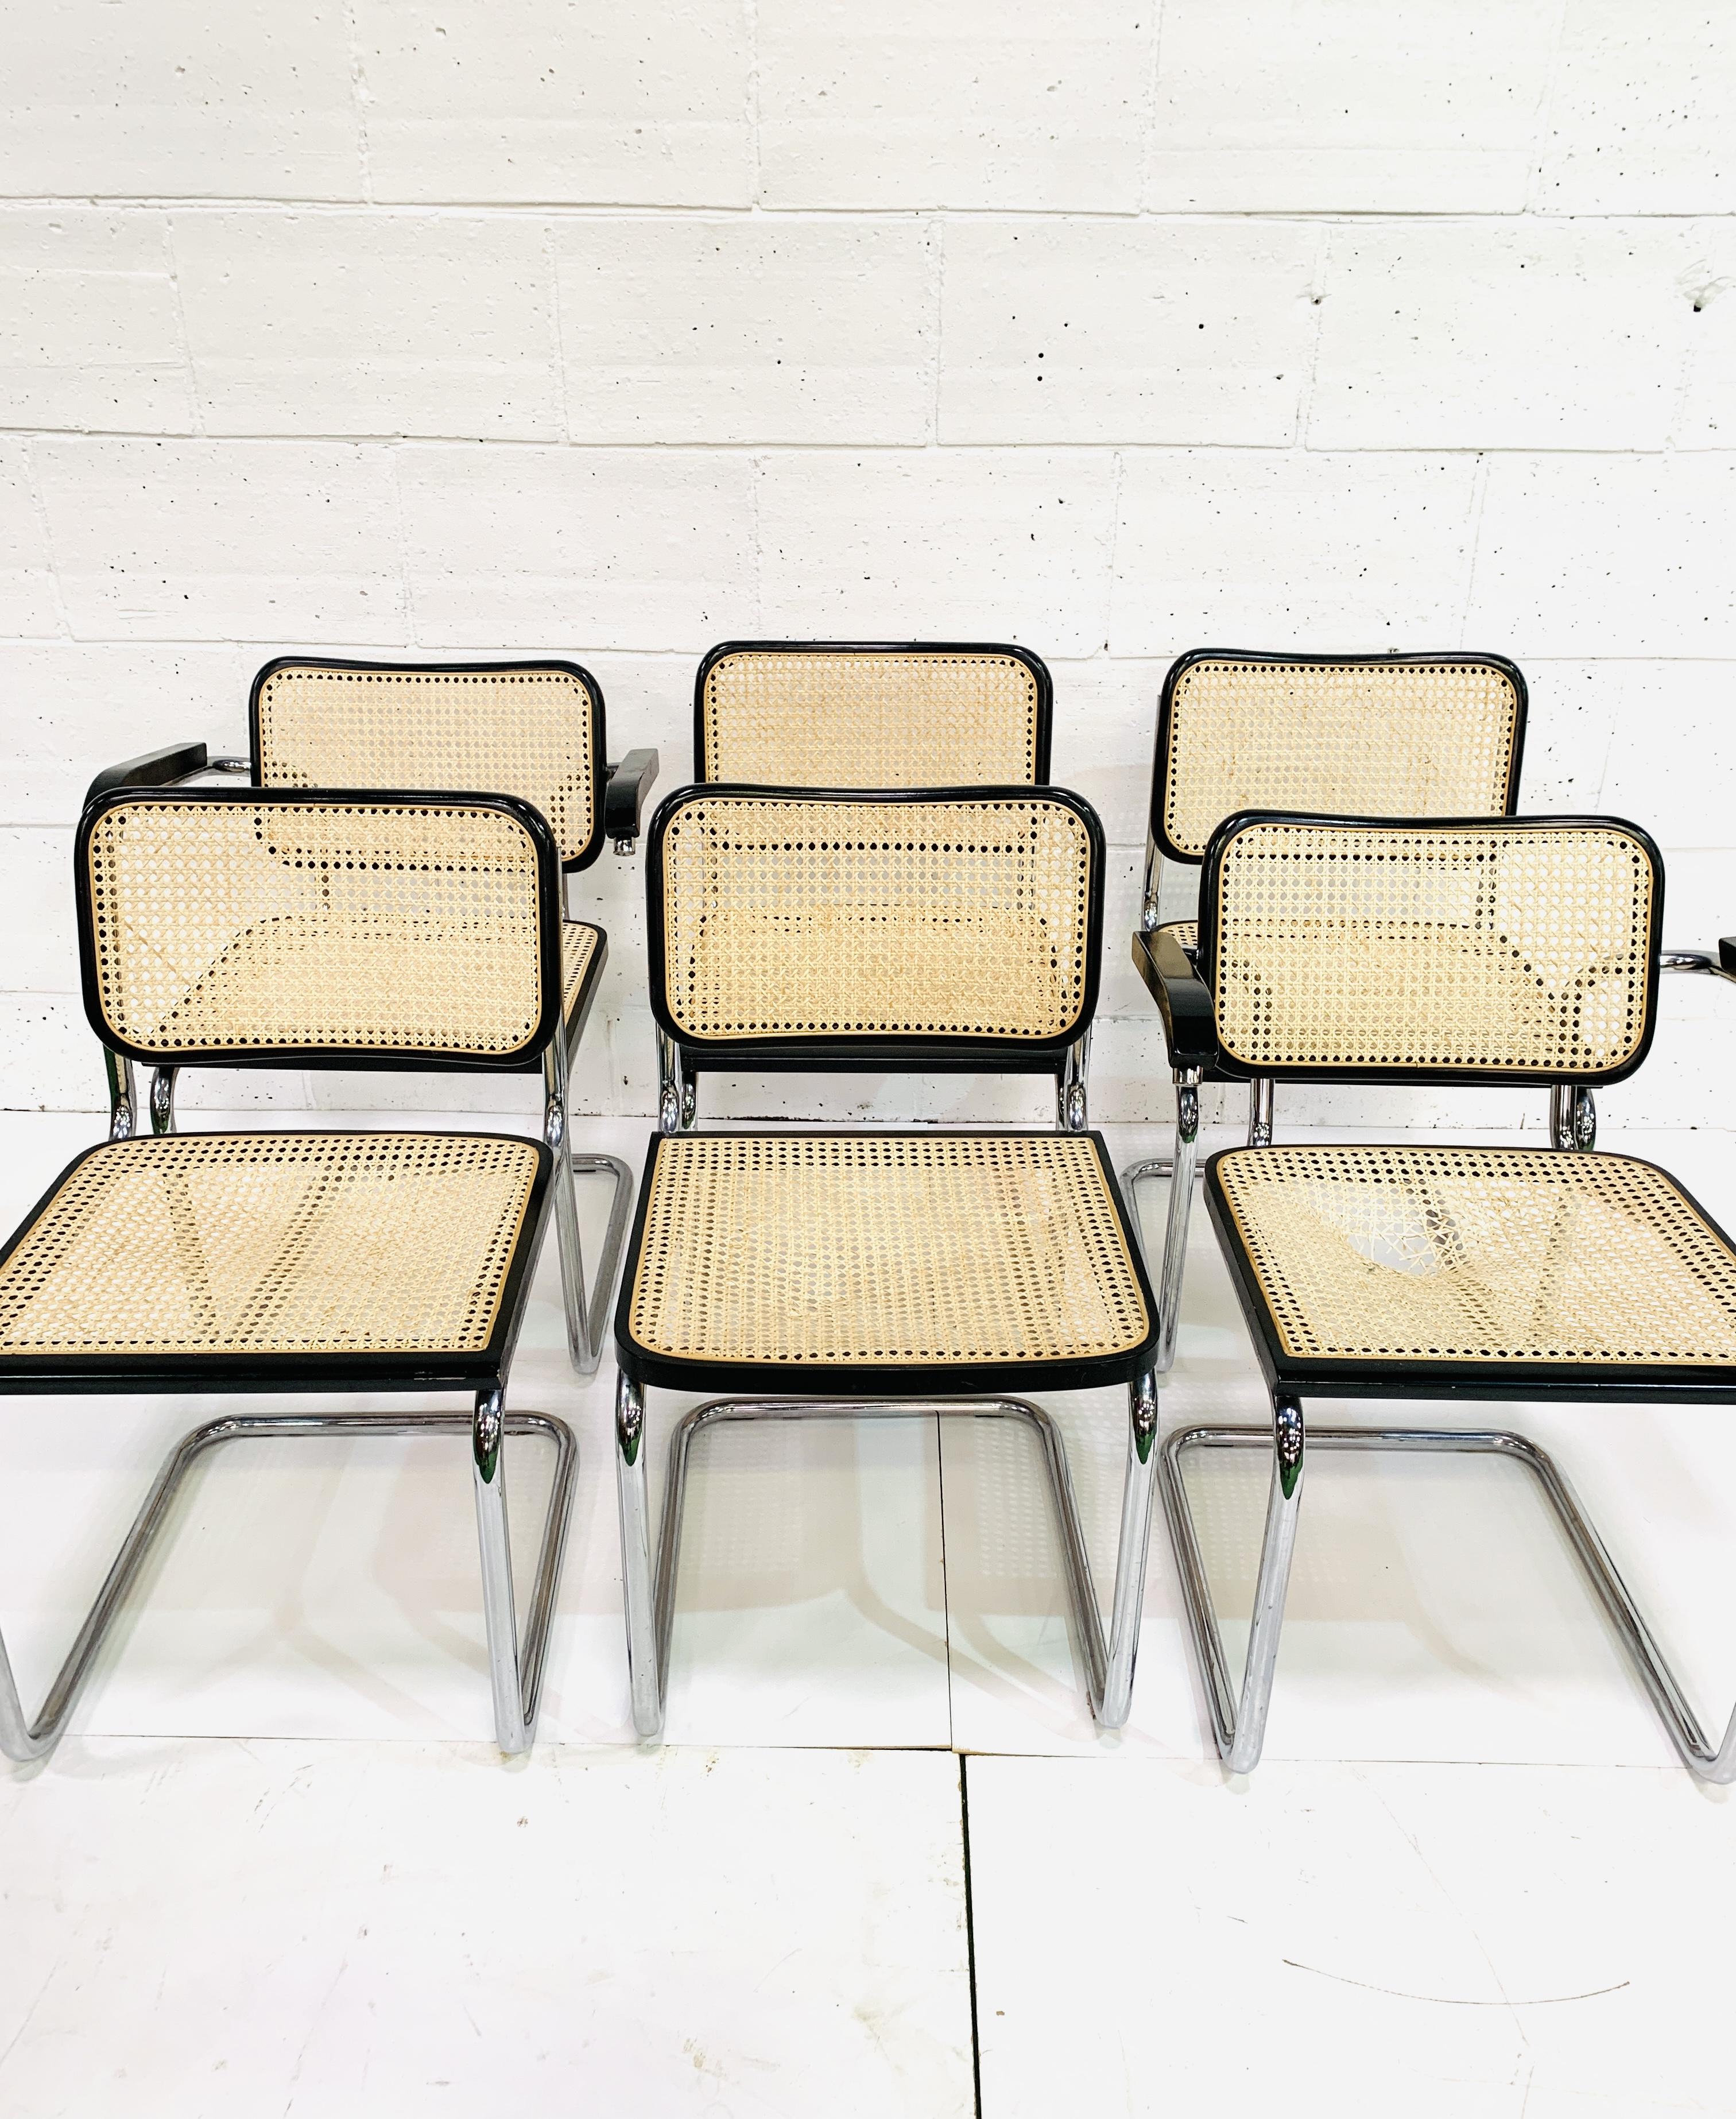 Group of six Italian chrome framed chairs